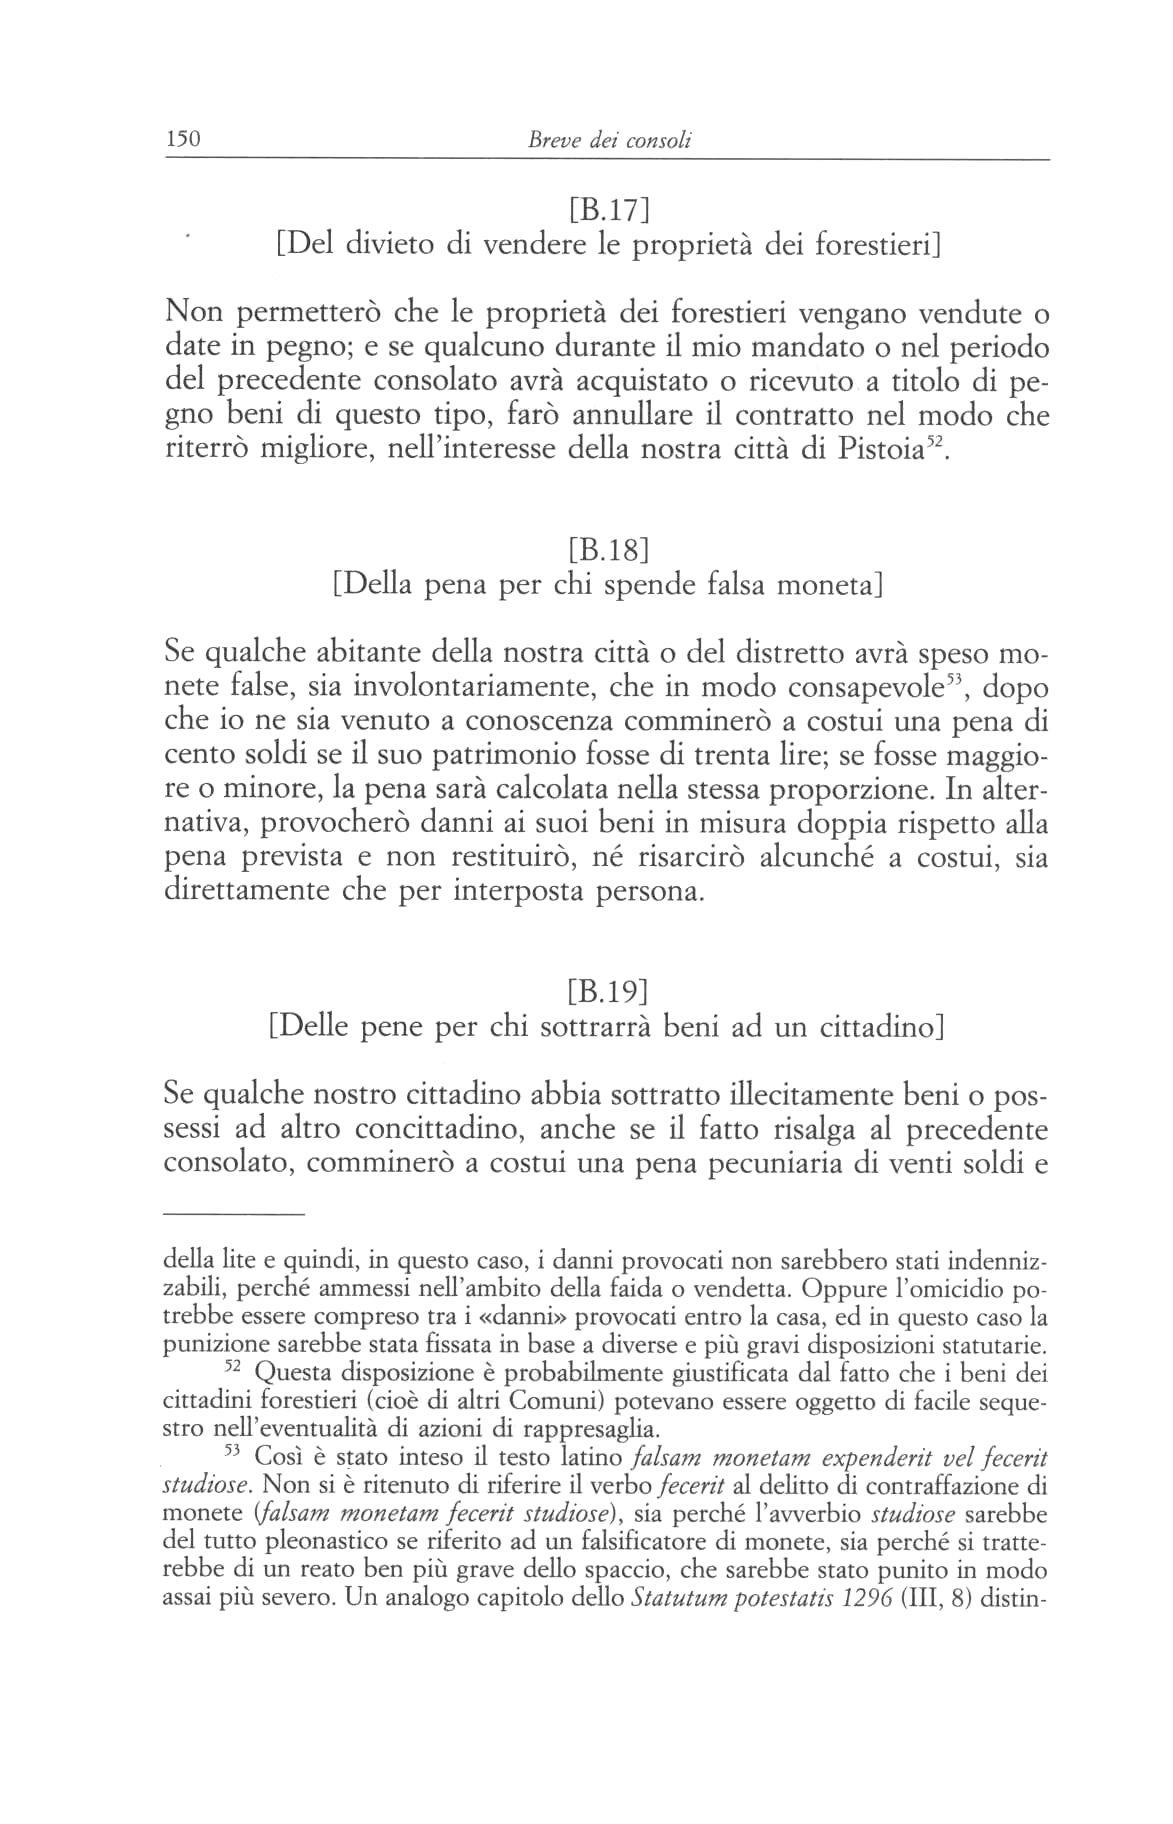 statuti pistoiesi del sec.XII 0150.jpg